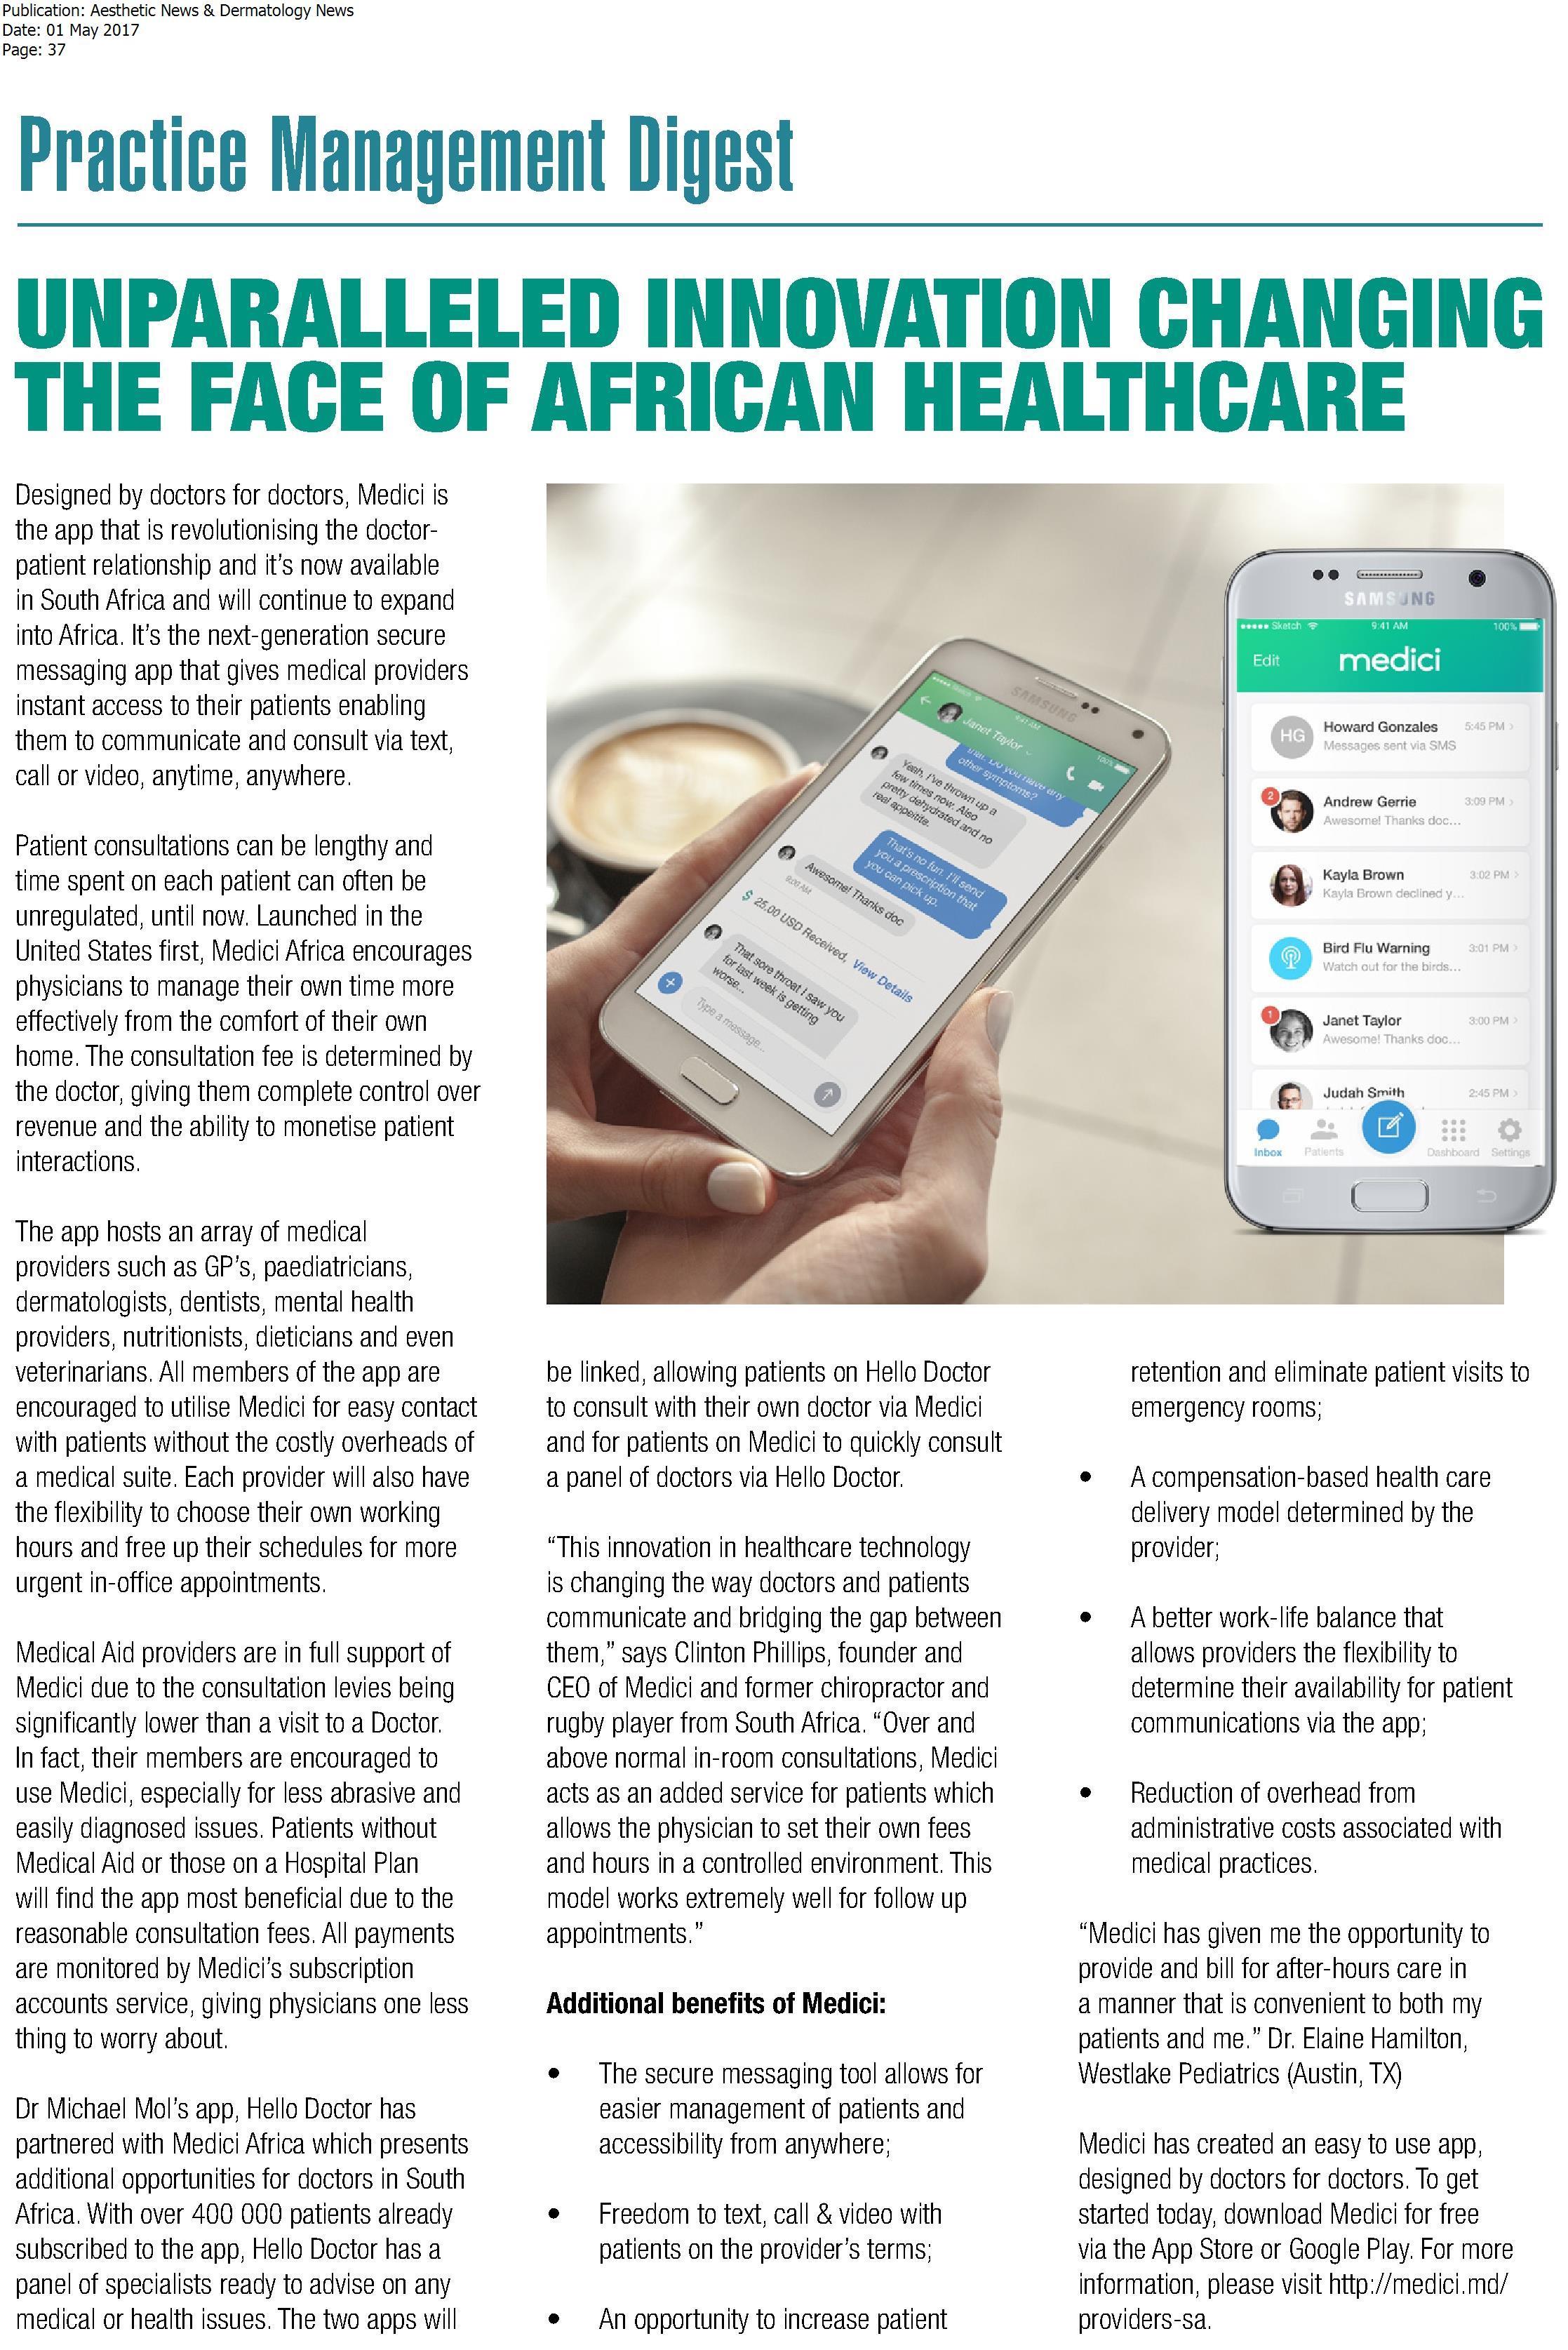 Aethetic News & Dermatology News -